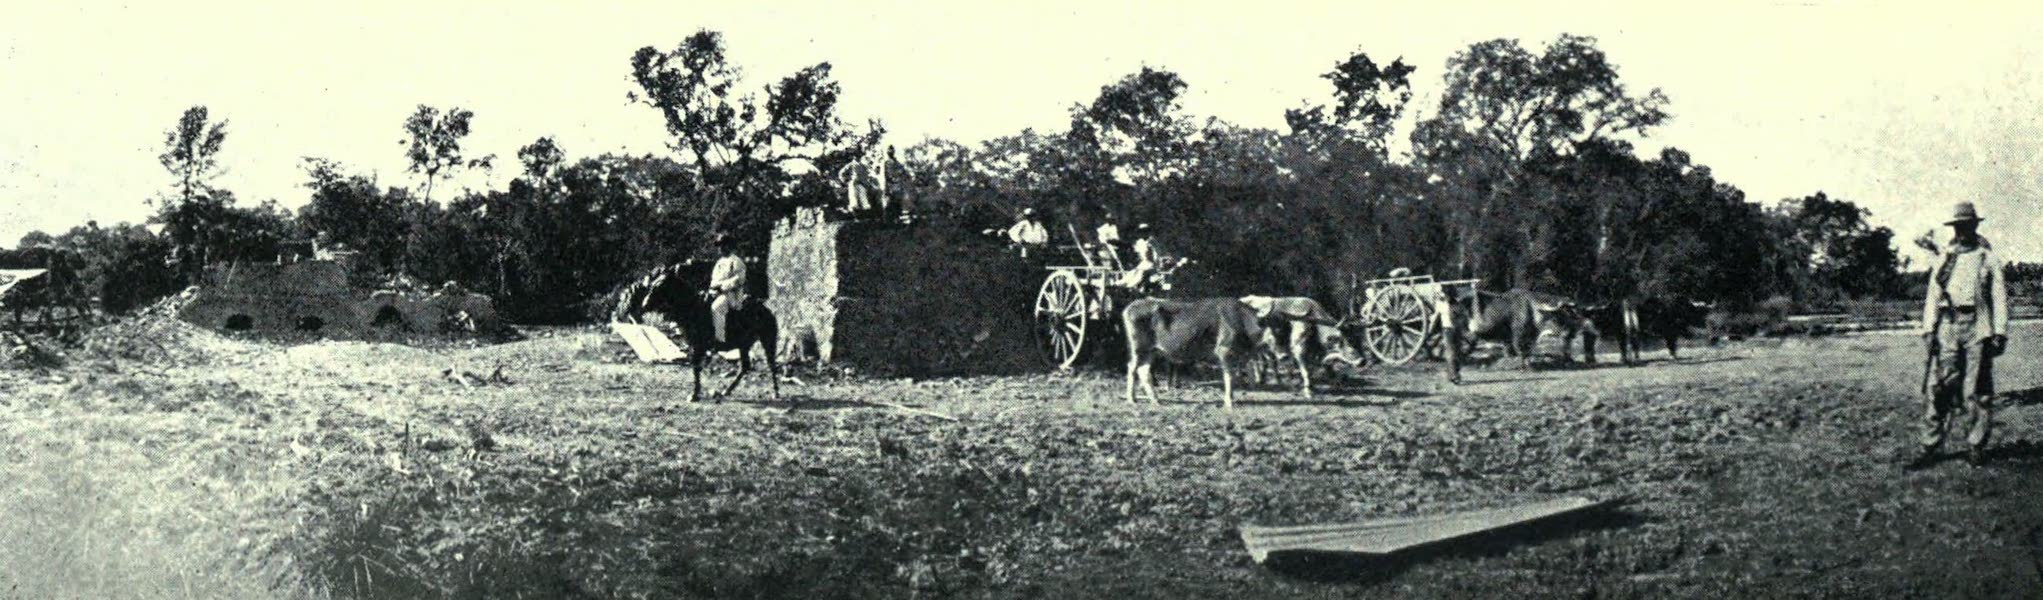 Paraguay by Henry Koebel - Brick Kiln, Chaco (1917)